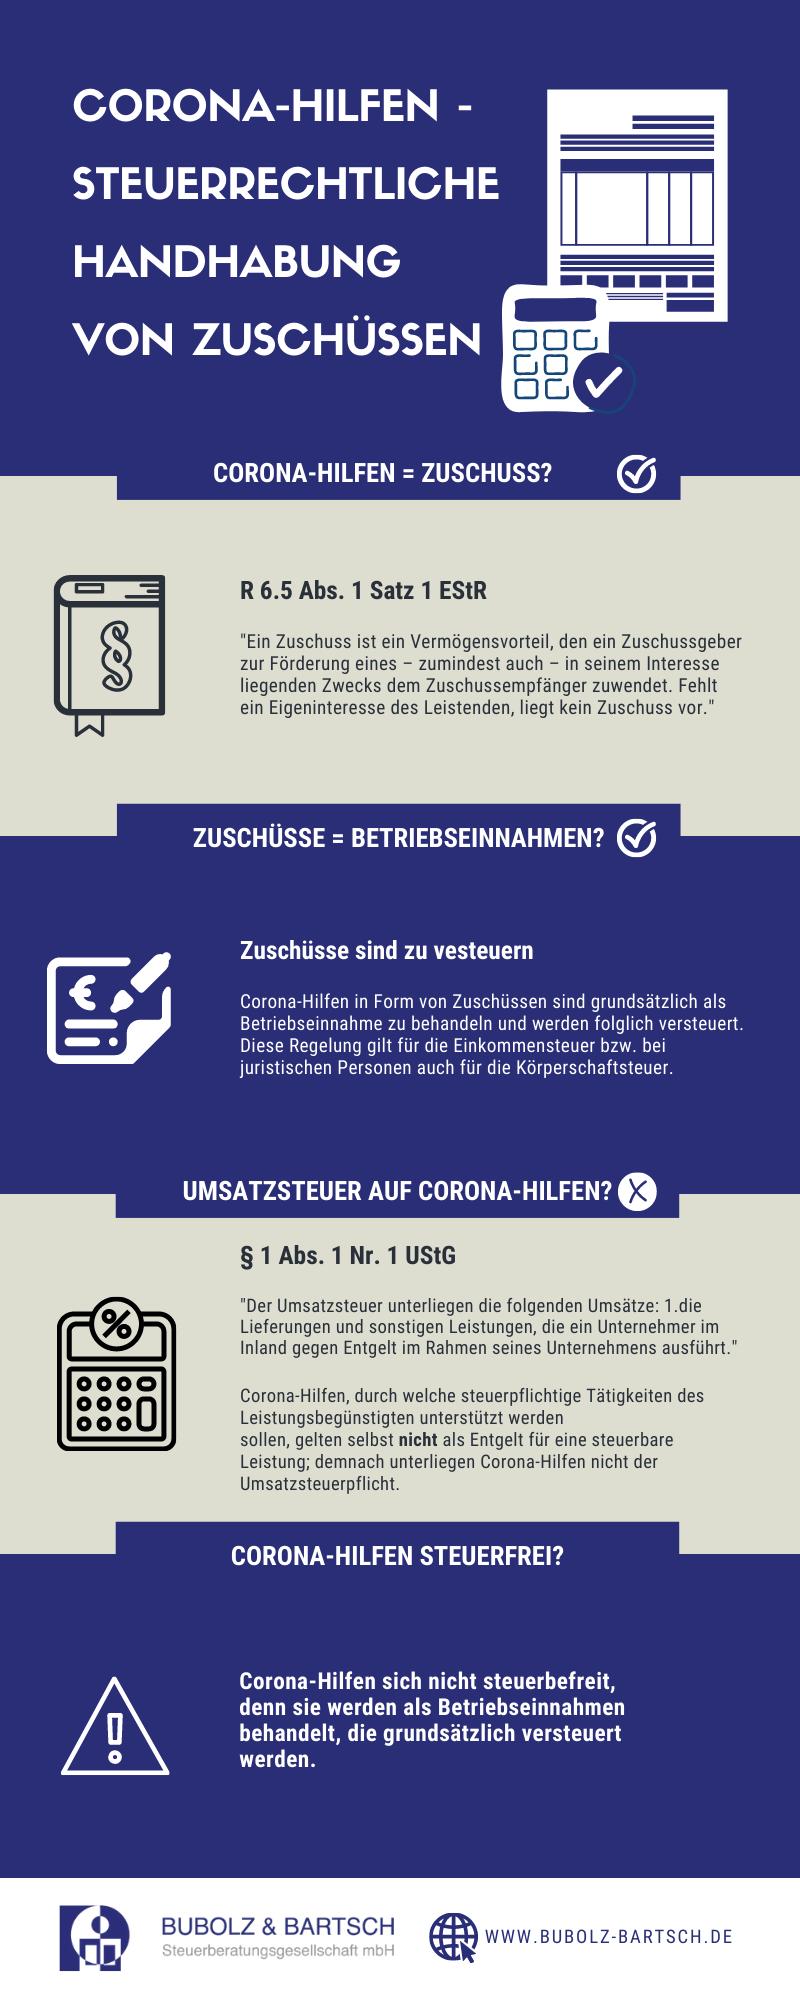 Infografik zum Thema Corona-Hilfen versteuern